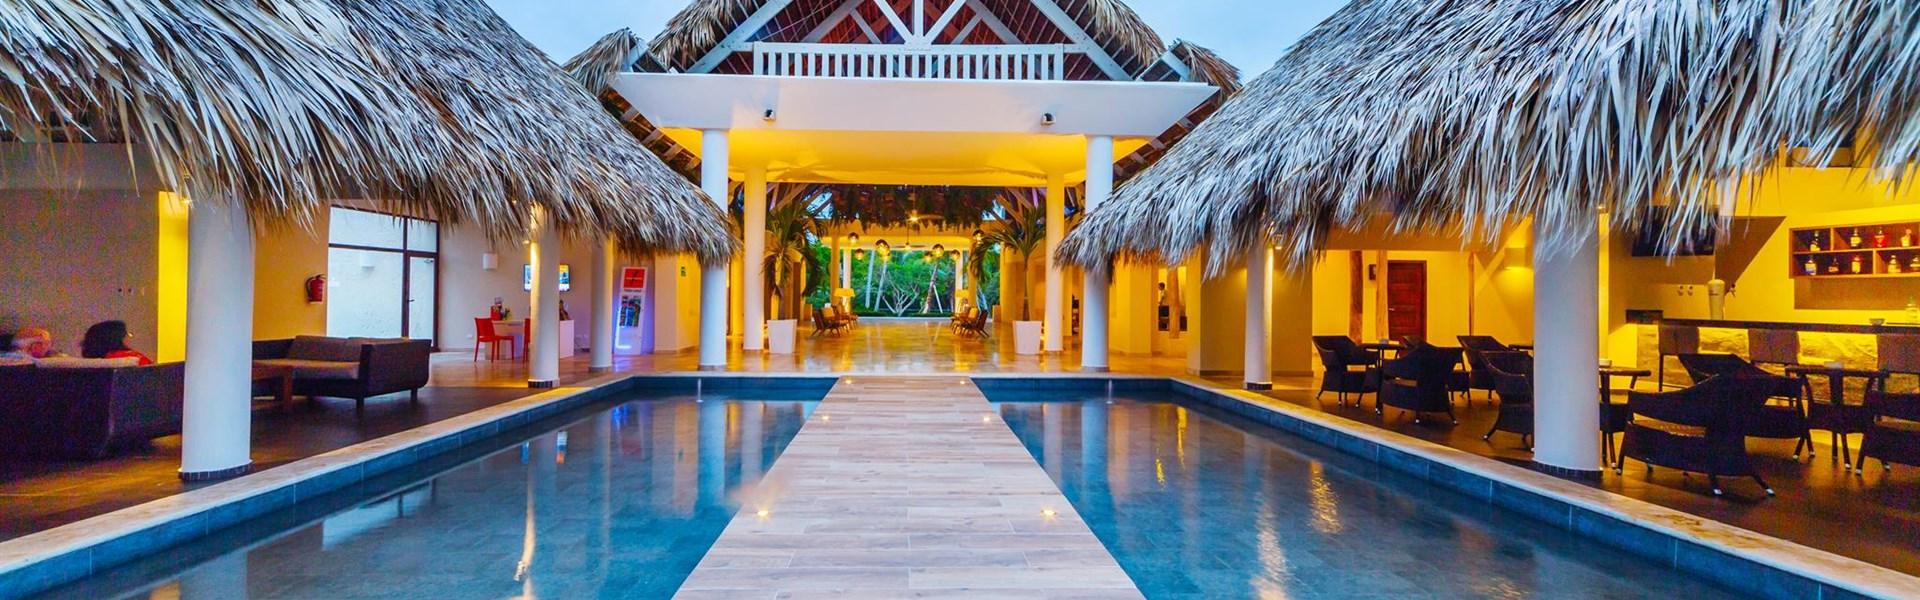 Marco Polo - Le Sivory Punta Cana -